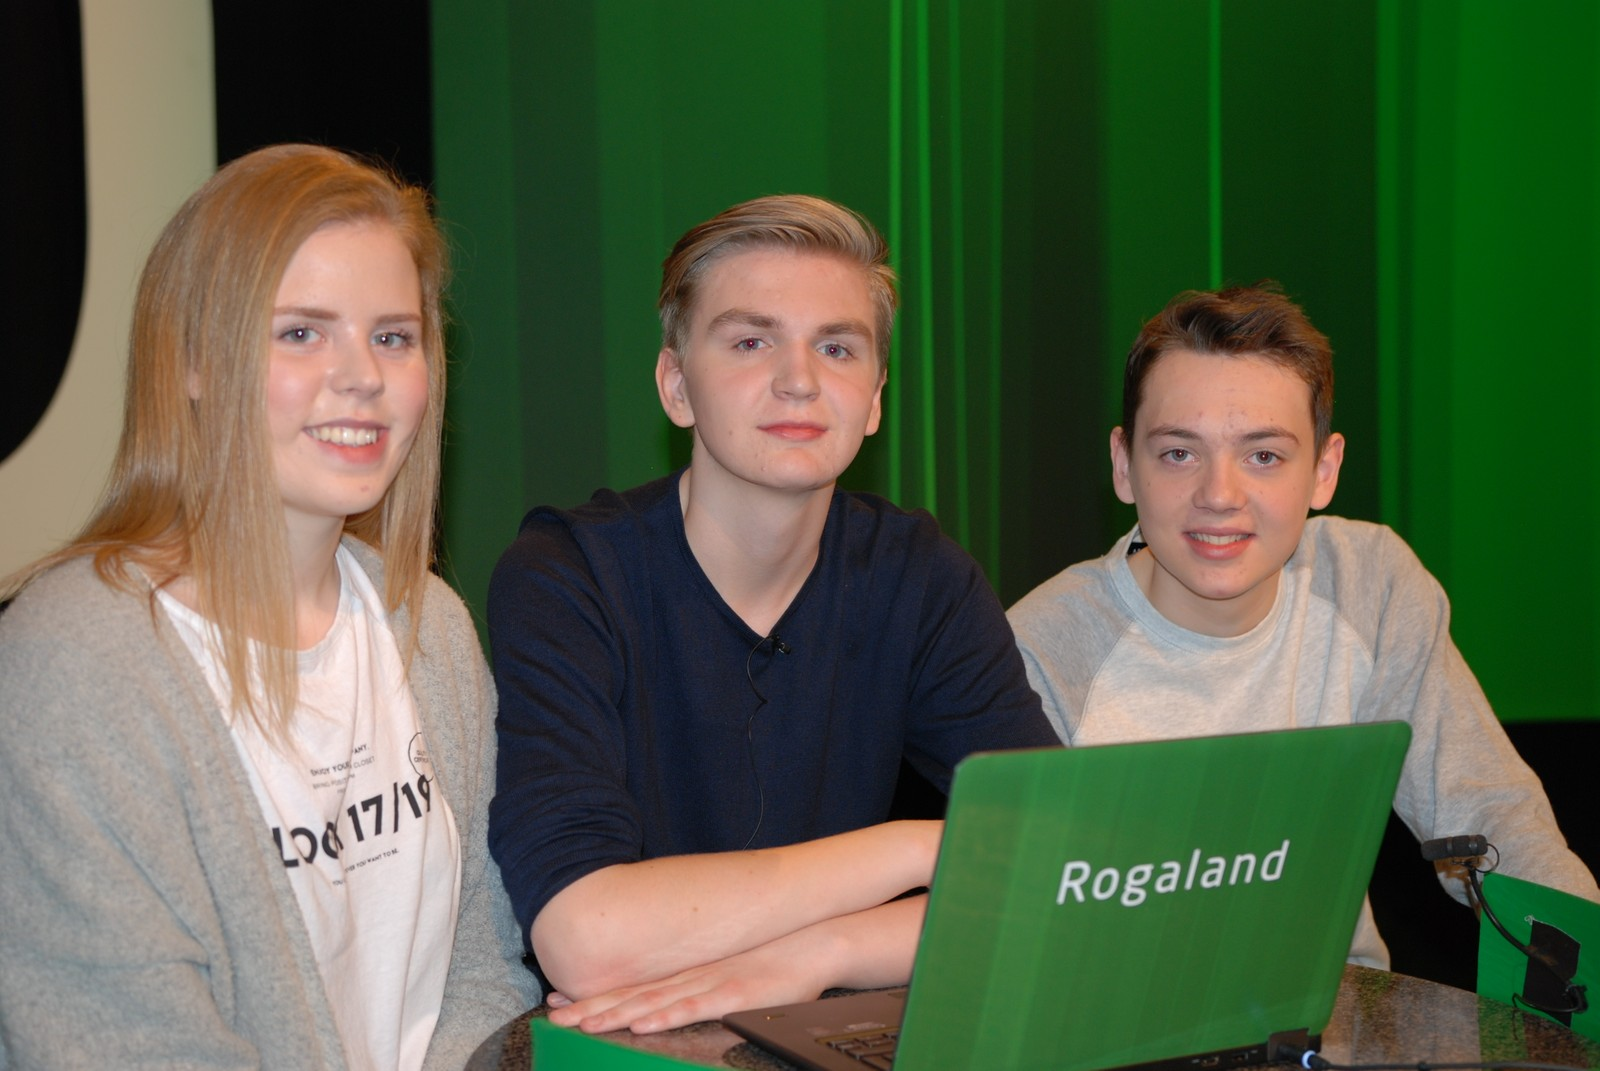 ROGALAND: Undheim skule i Time representert ved Sebastian Bø, Henning Undheim og Emilia Taksdal.